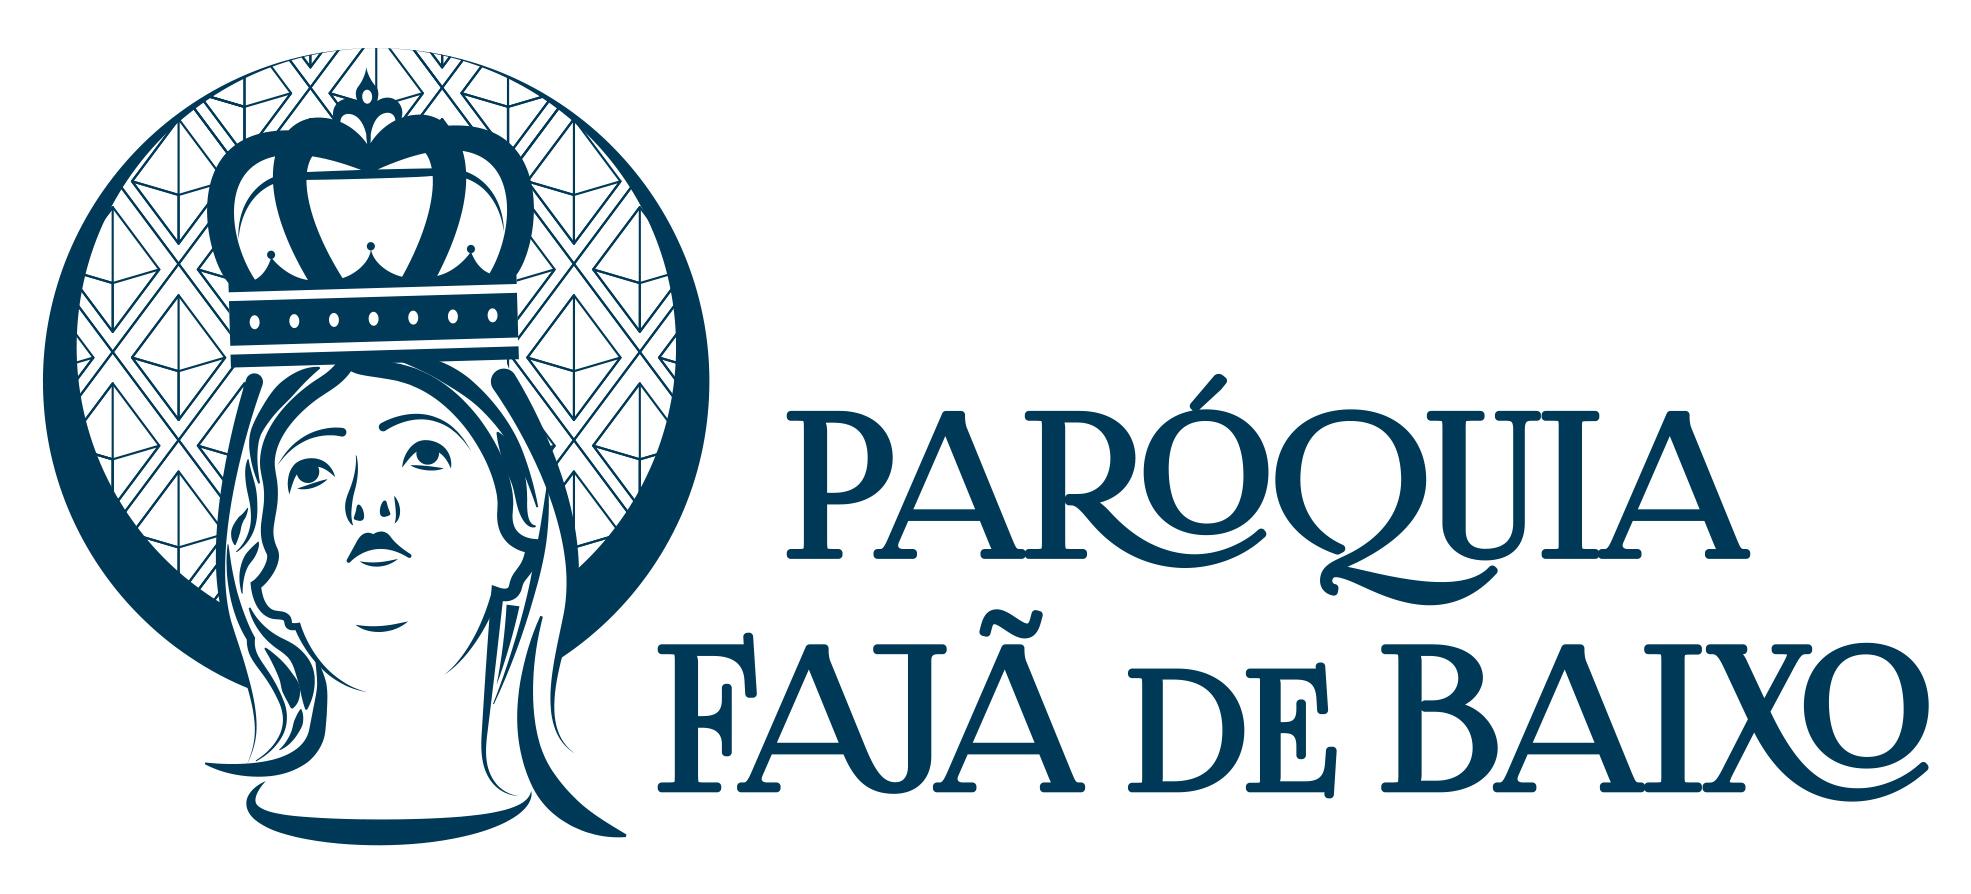 LOGOTIPO DA PAROQUIA